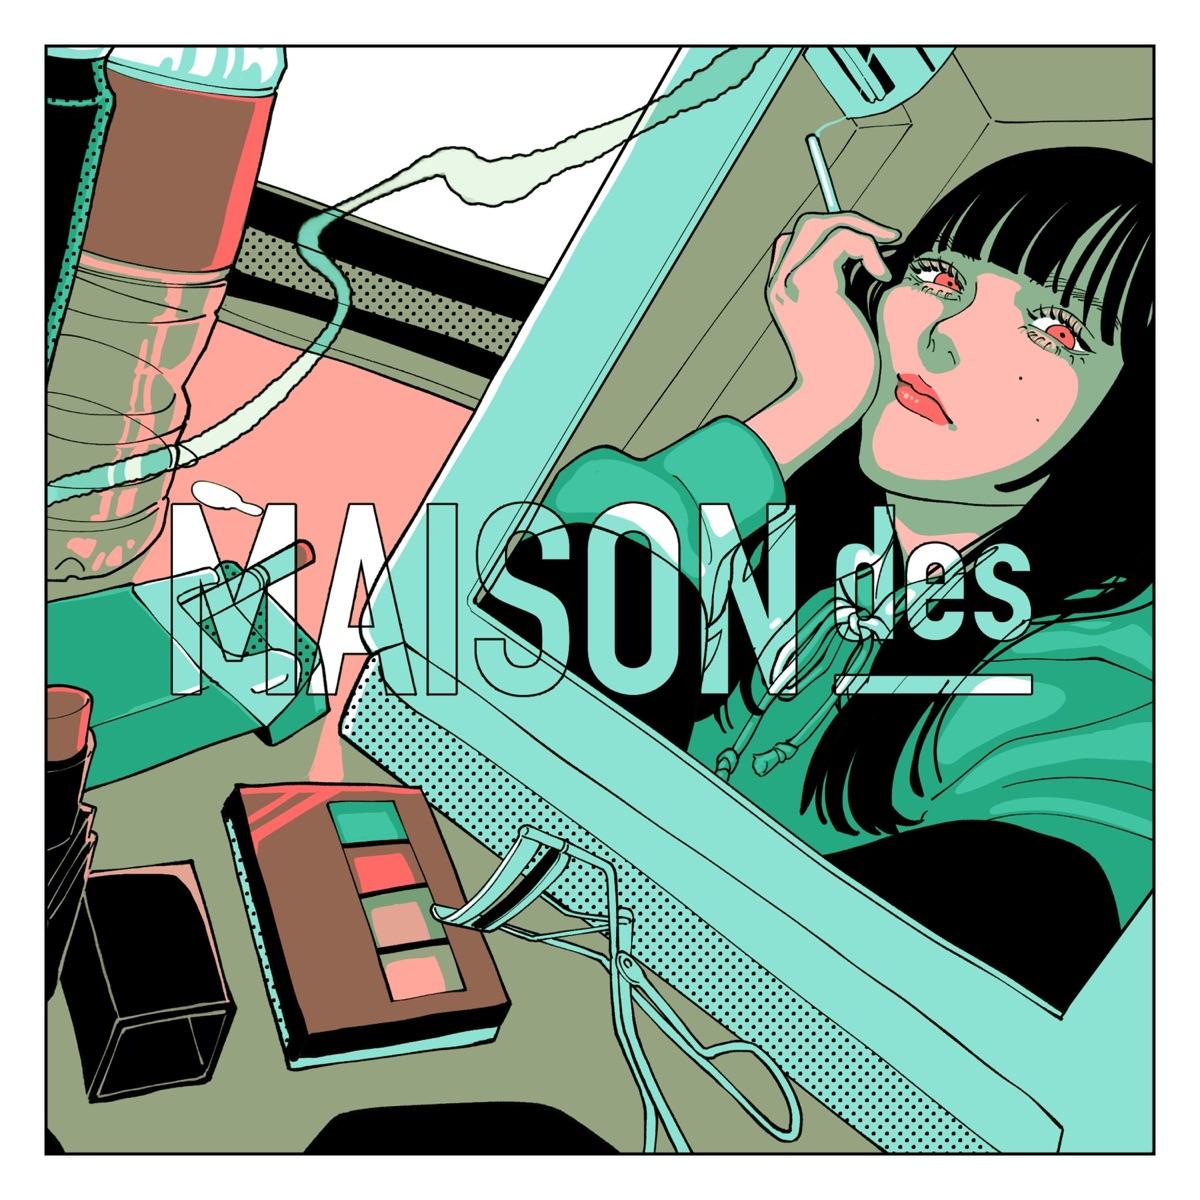 『MAISONdes - Hello/Hello feat. yama, 泣き虫☔ 歌詞』収録の『Hello/Hello feat. yama, 泣き虫☔』ジャケット